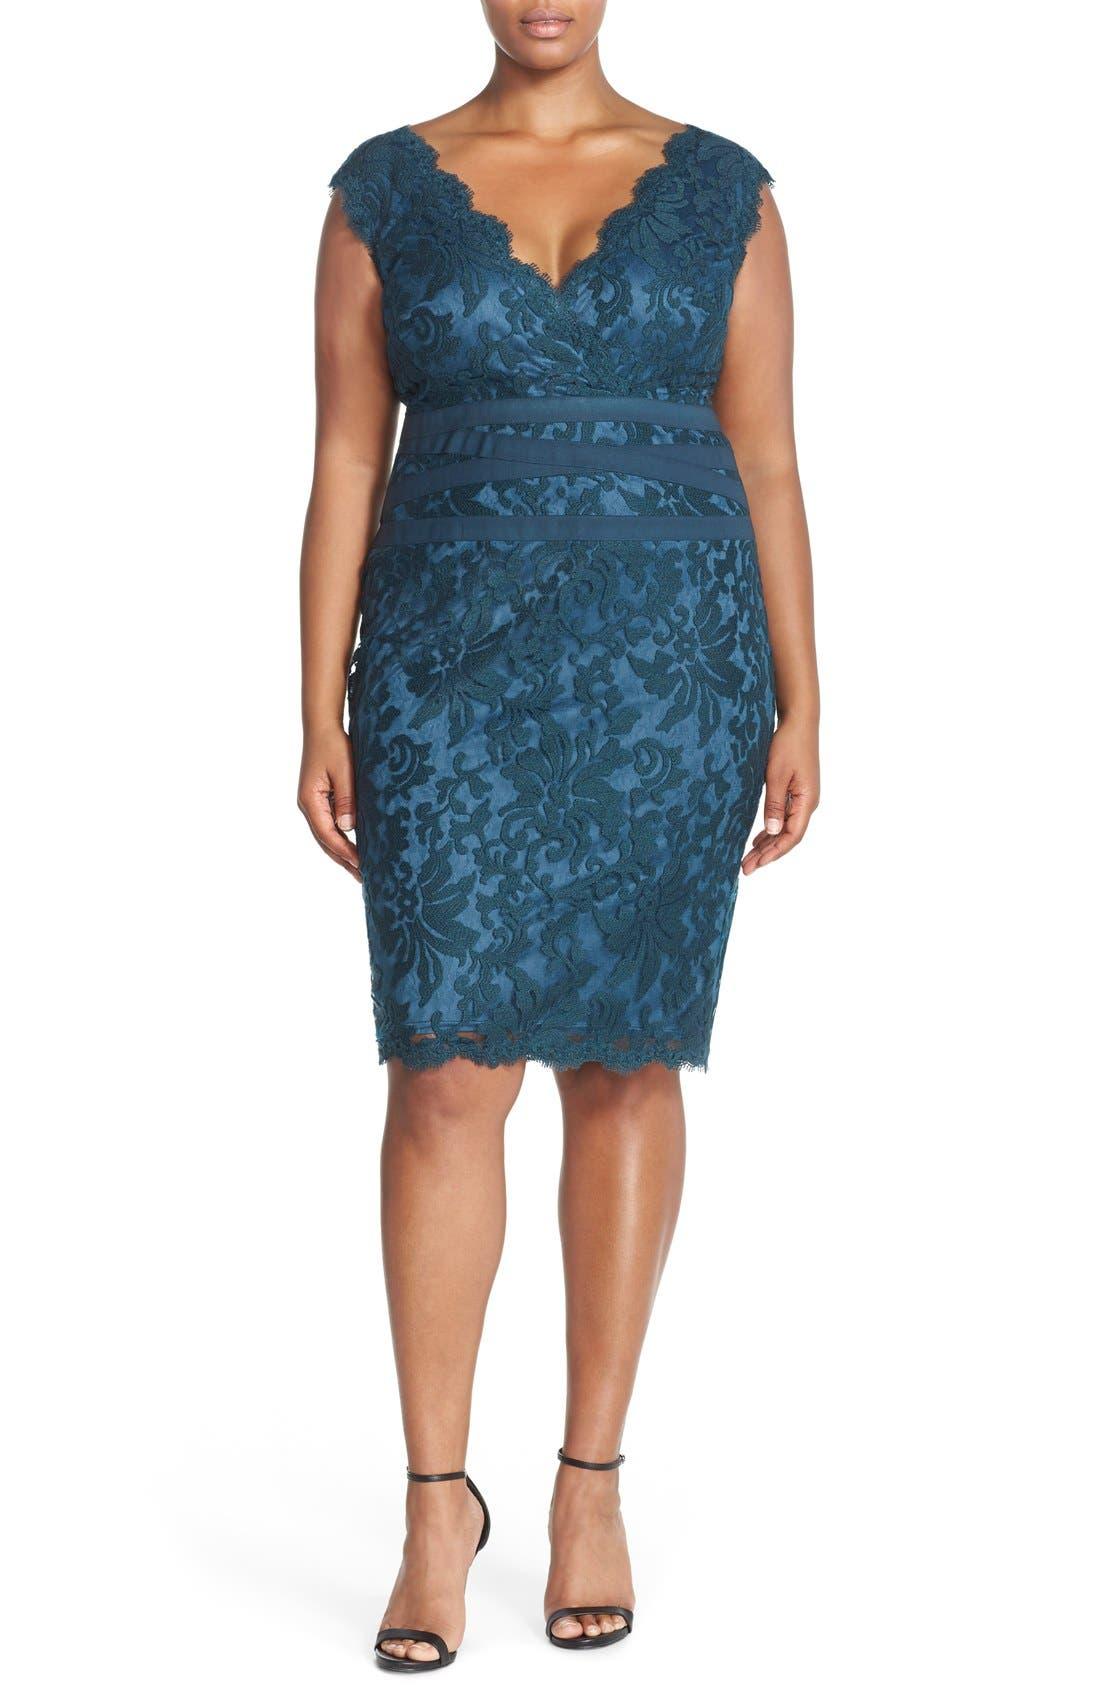 Alternate Image 1 Selected - Tadashi Shoji Embroidered Lace Sheath Dress (Plus Size)